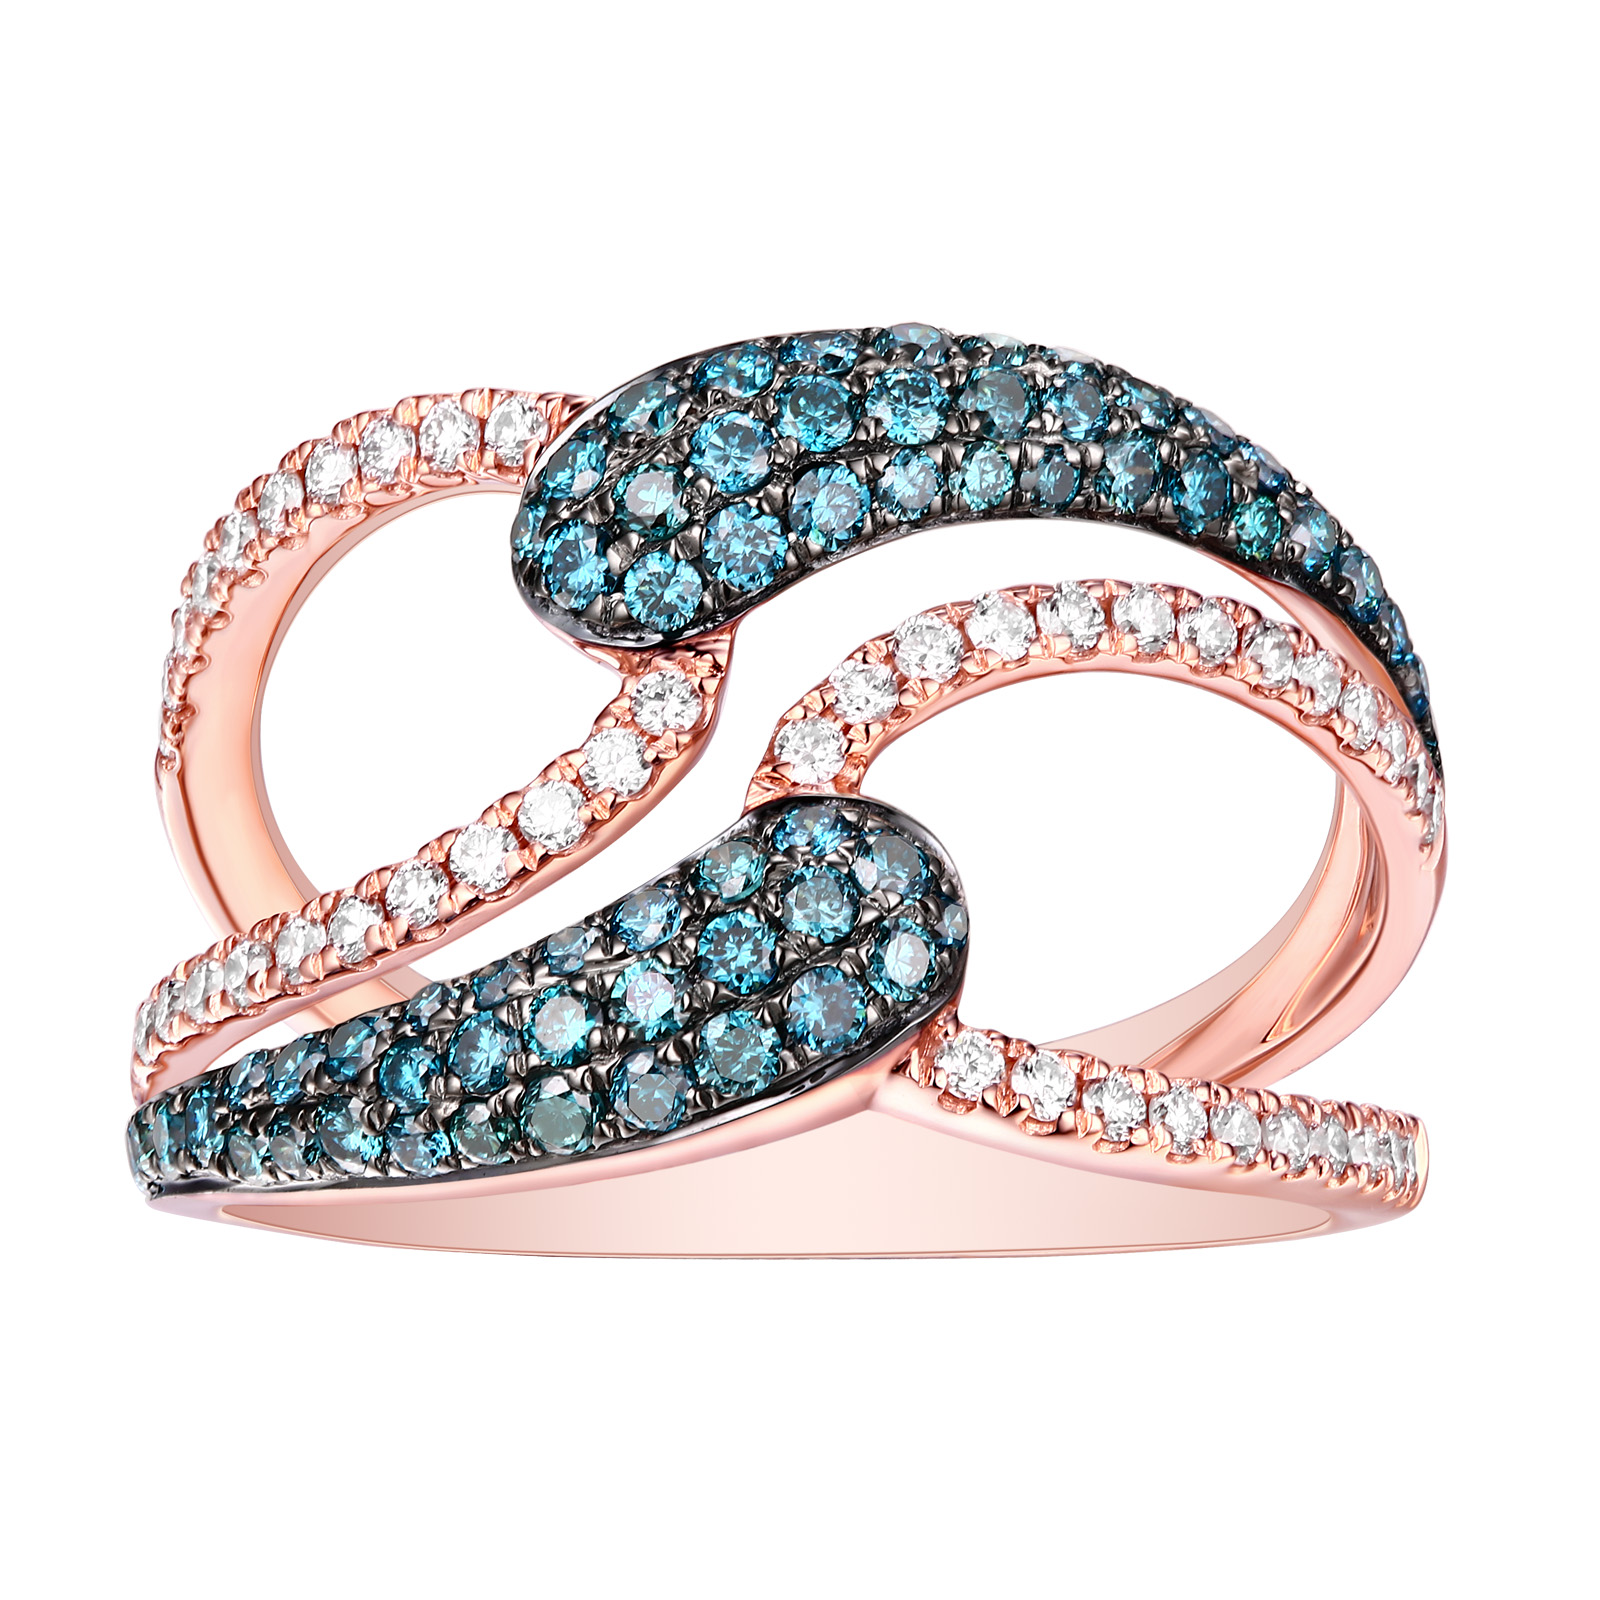 R26572ICE- 14K Rose Gold Diamond Ring, 0.88 TCW